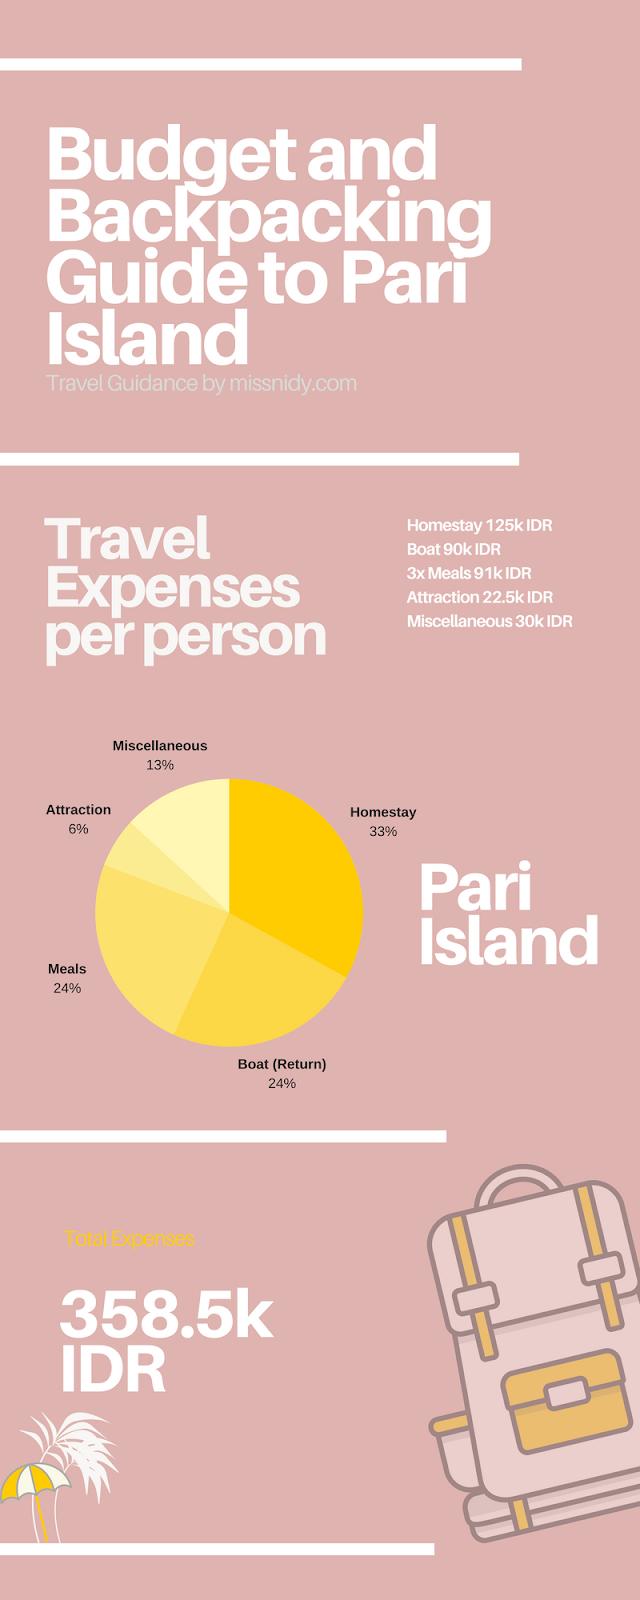 budget trip ke pulau pari tanpa travel agent